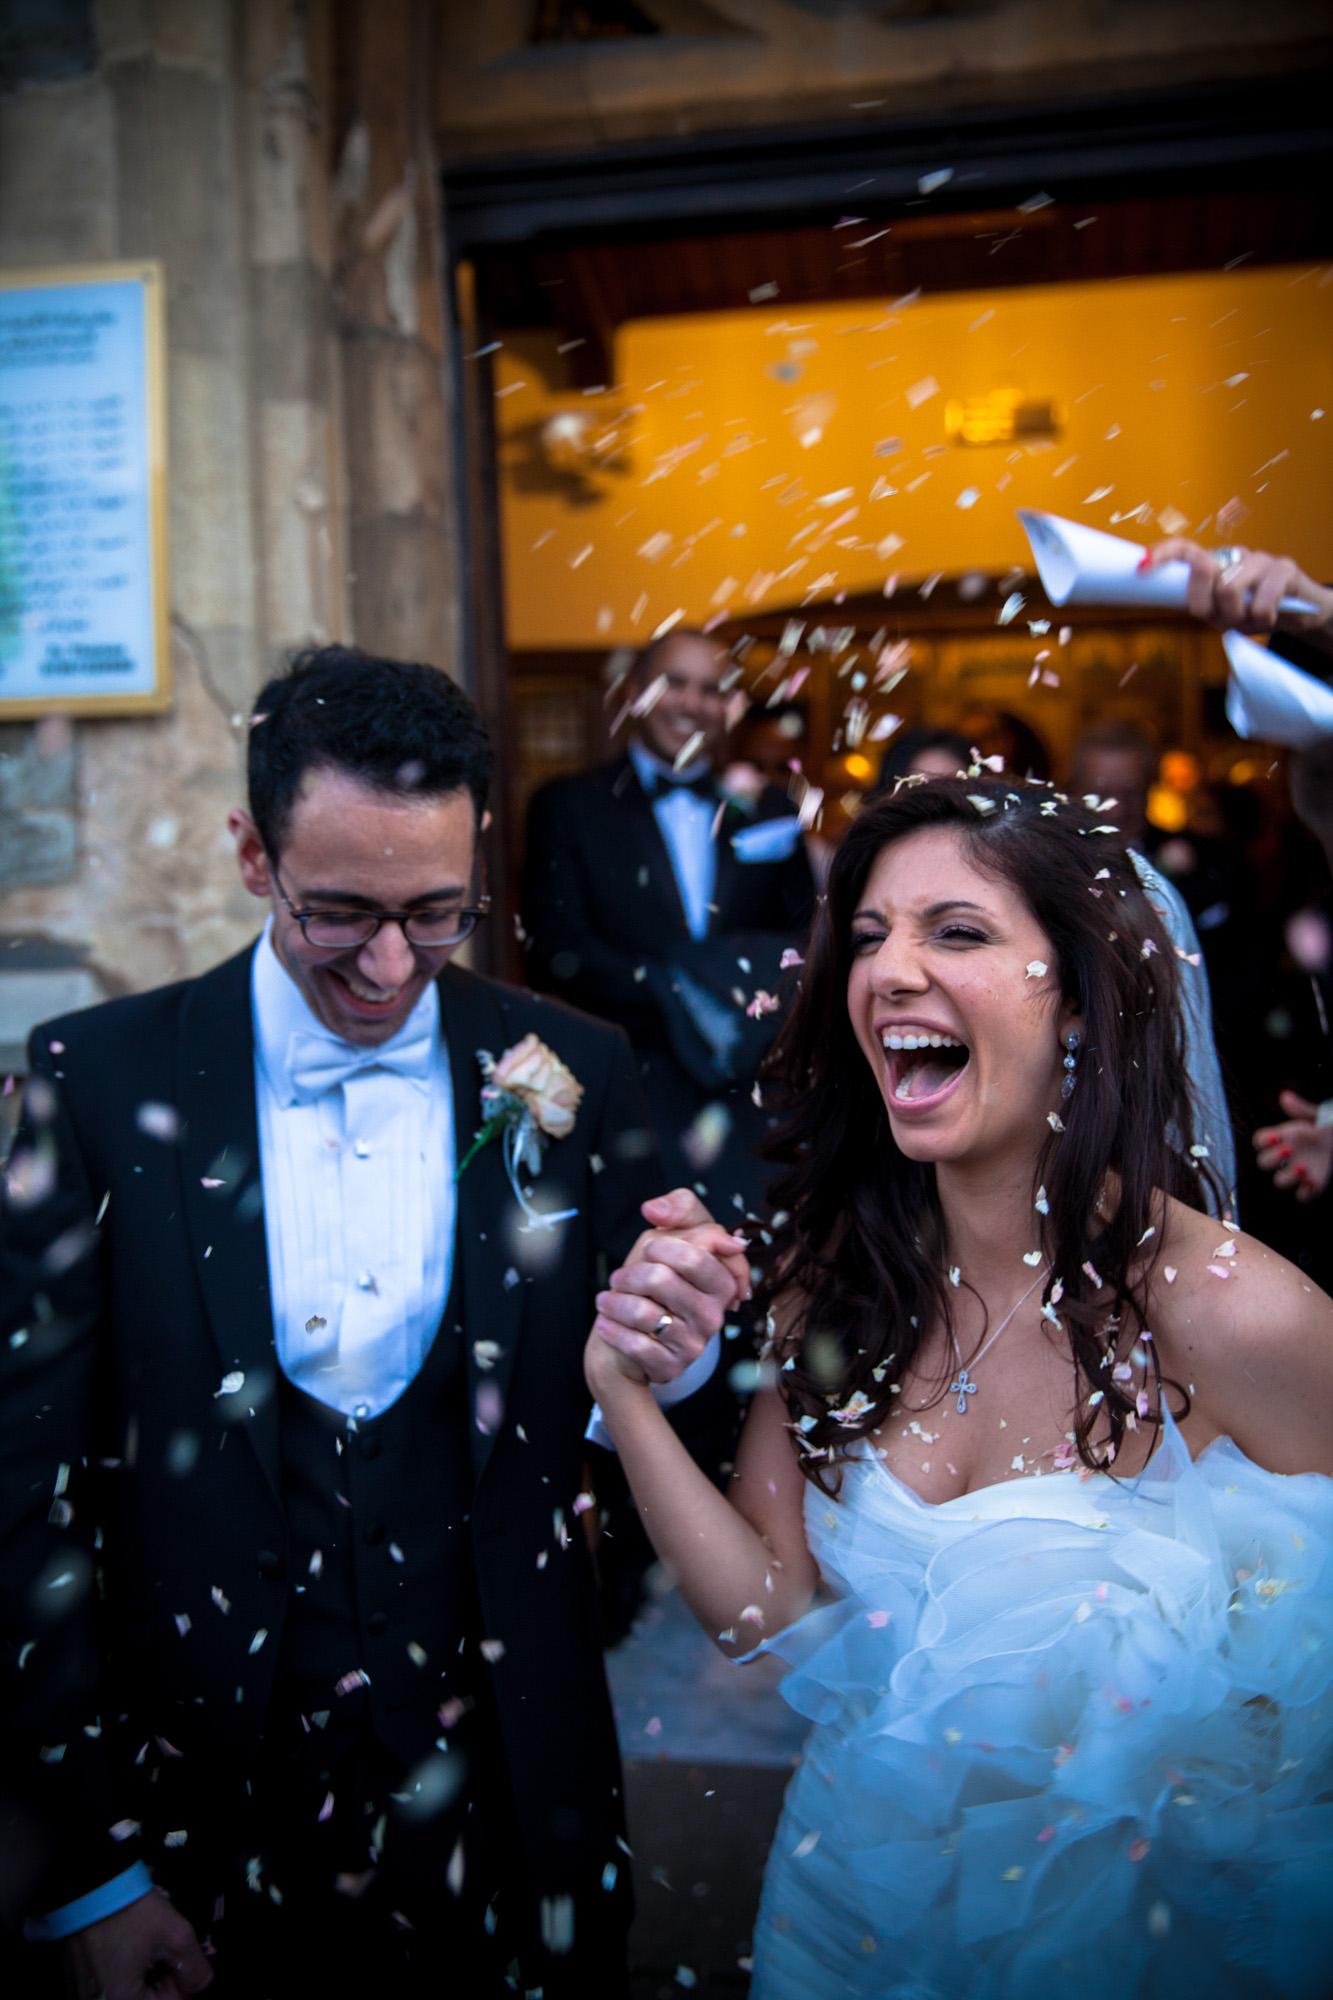 weddings-couples-love-photographer-oxford-london-jonathan-self-photography-47.jpg